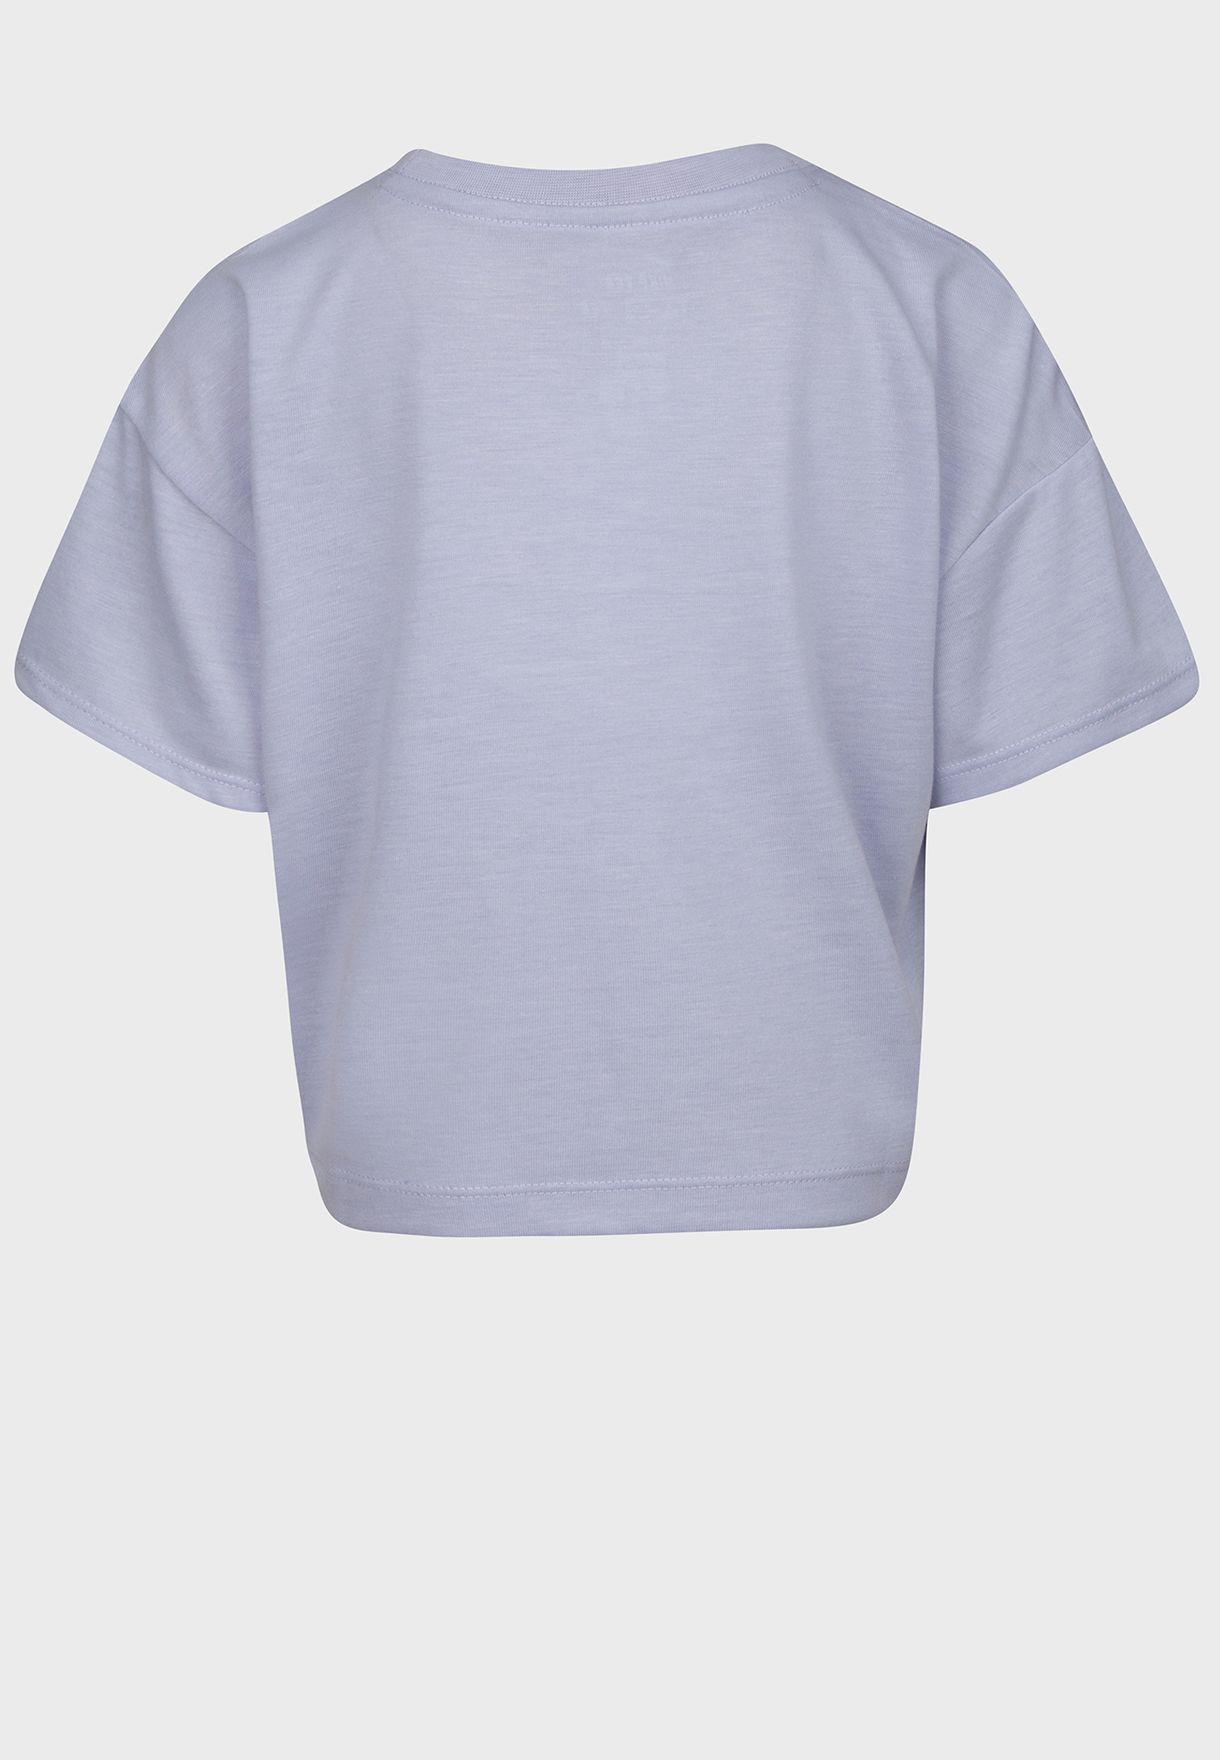 Kids Futura Sprinkles Drapey T-Shirt